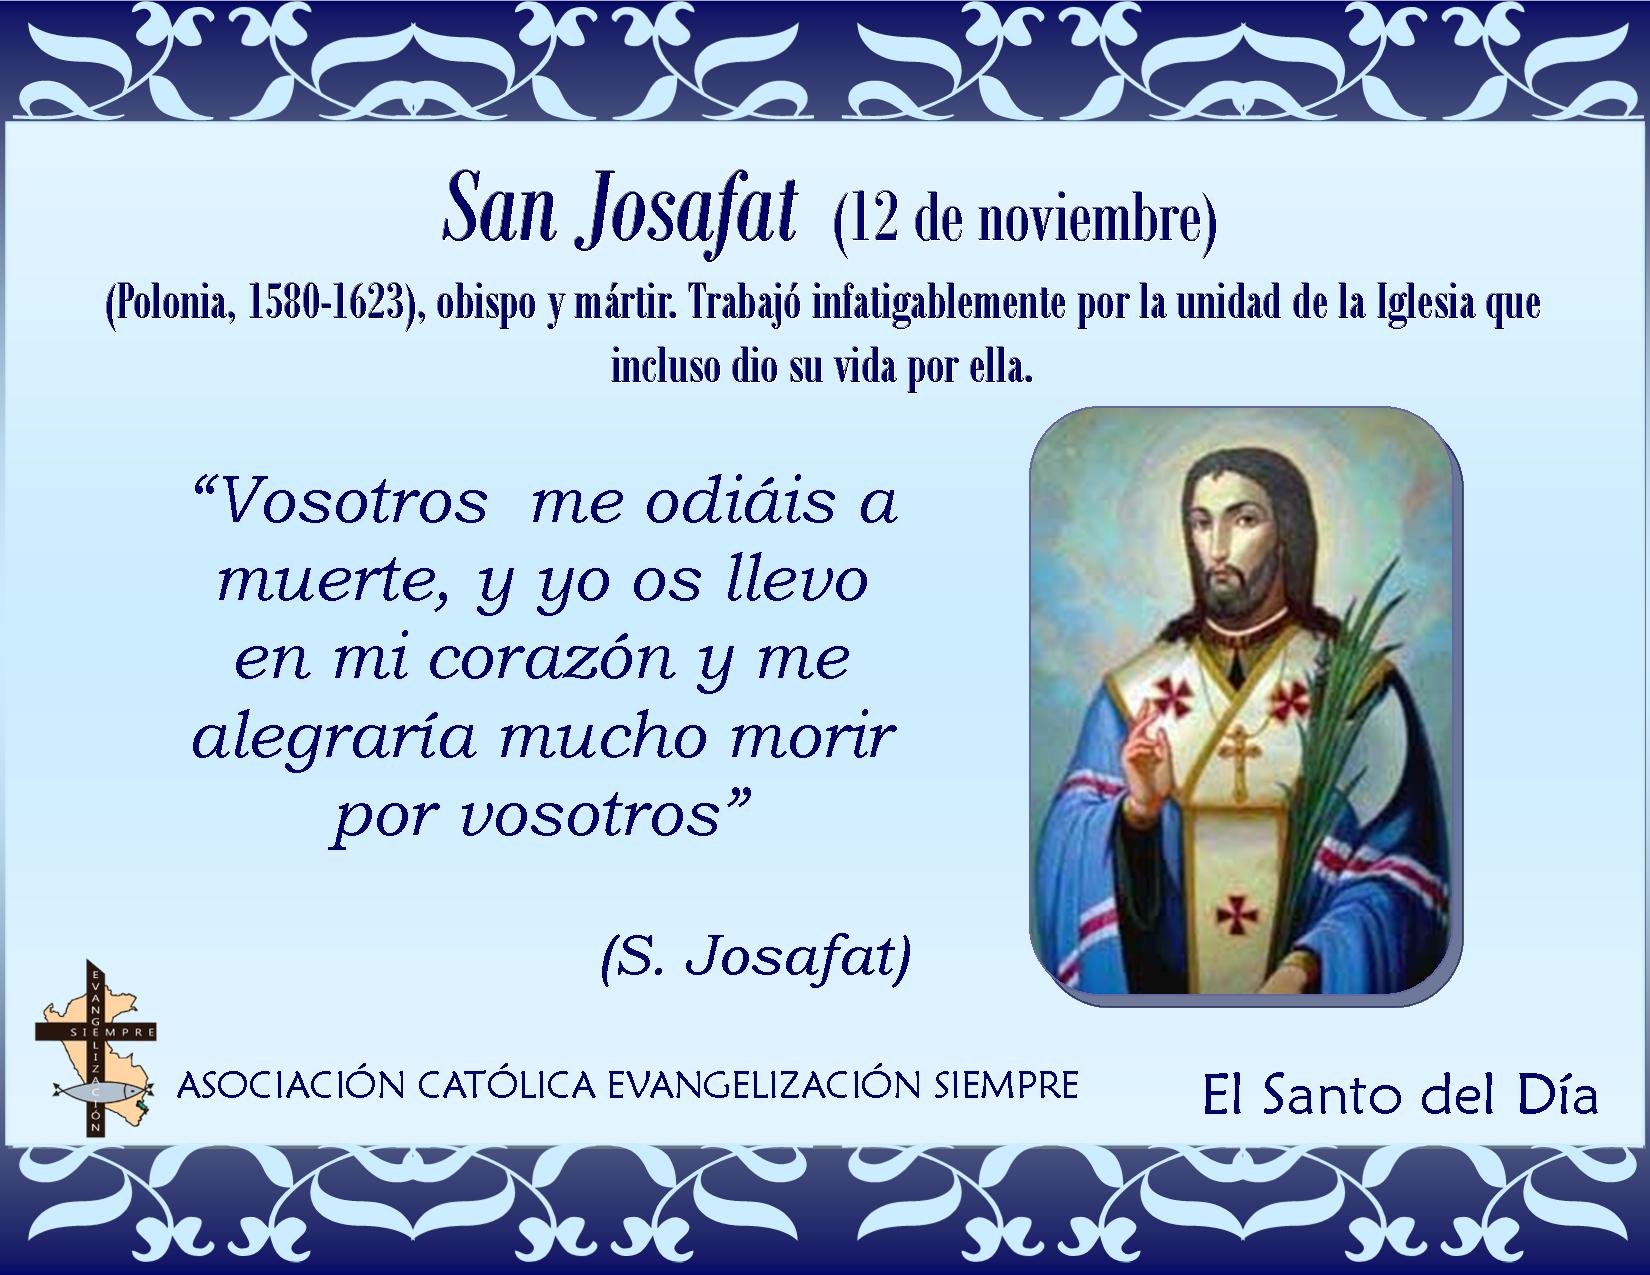 santo-del-dia-12-noviembre